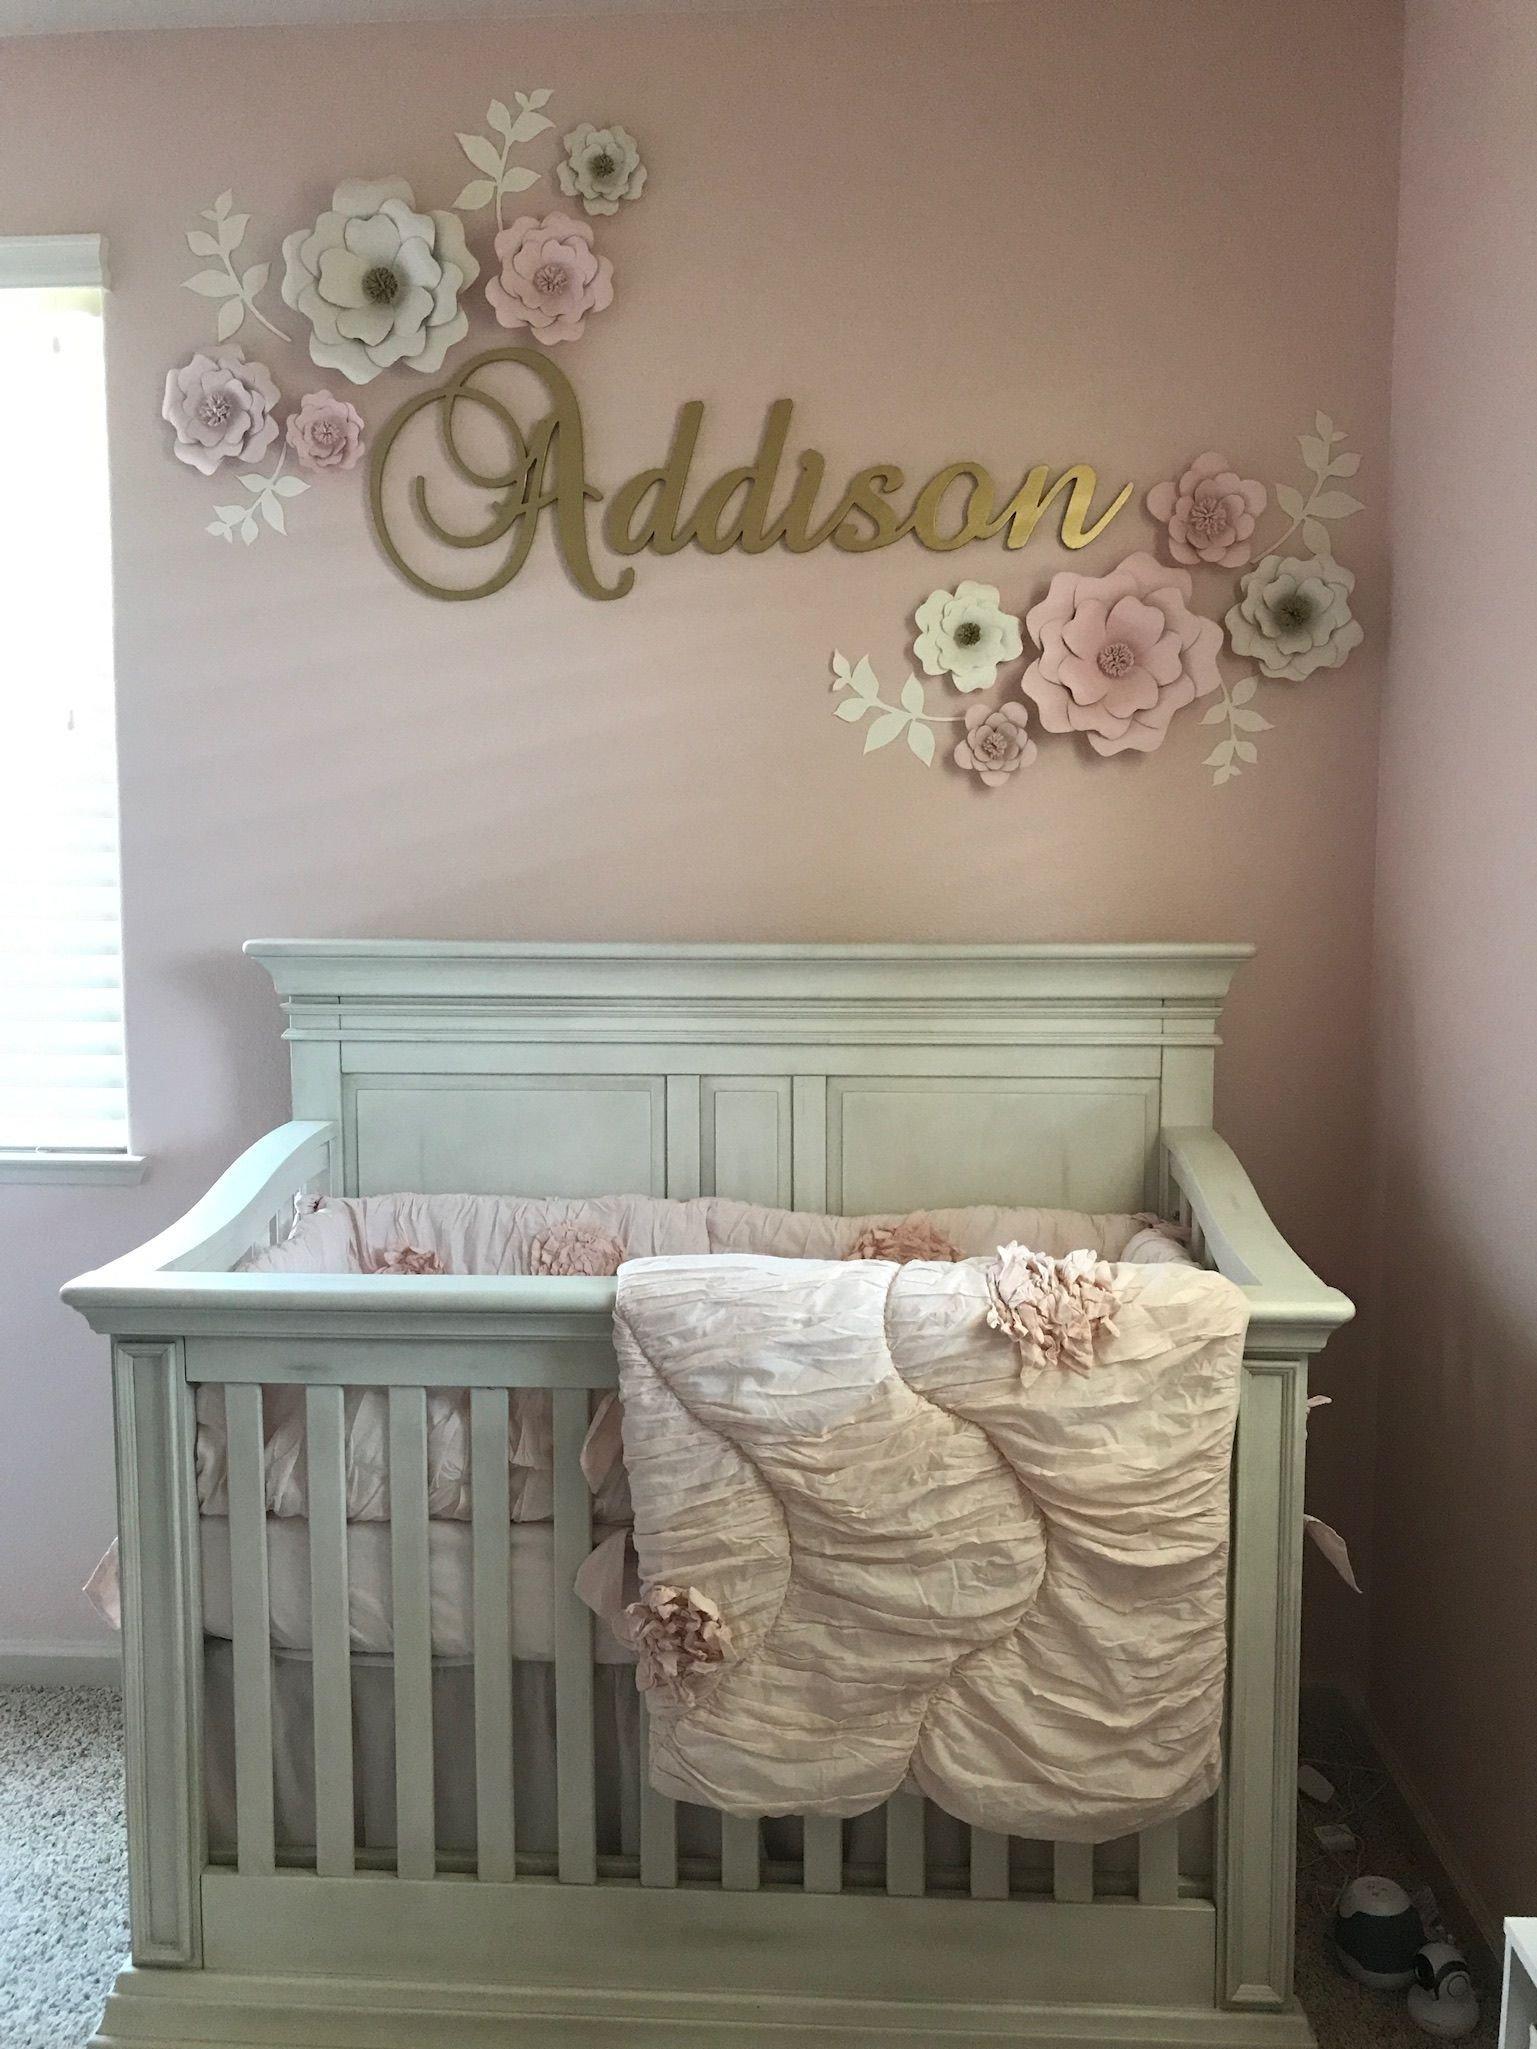 Baby Girl Nursery Decor Ideas Elegant Baby Girl Nursery with Pink and Gold theme Baby Girl Nursery Pinterest